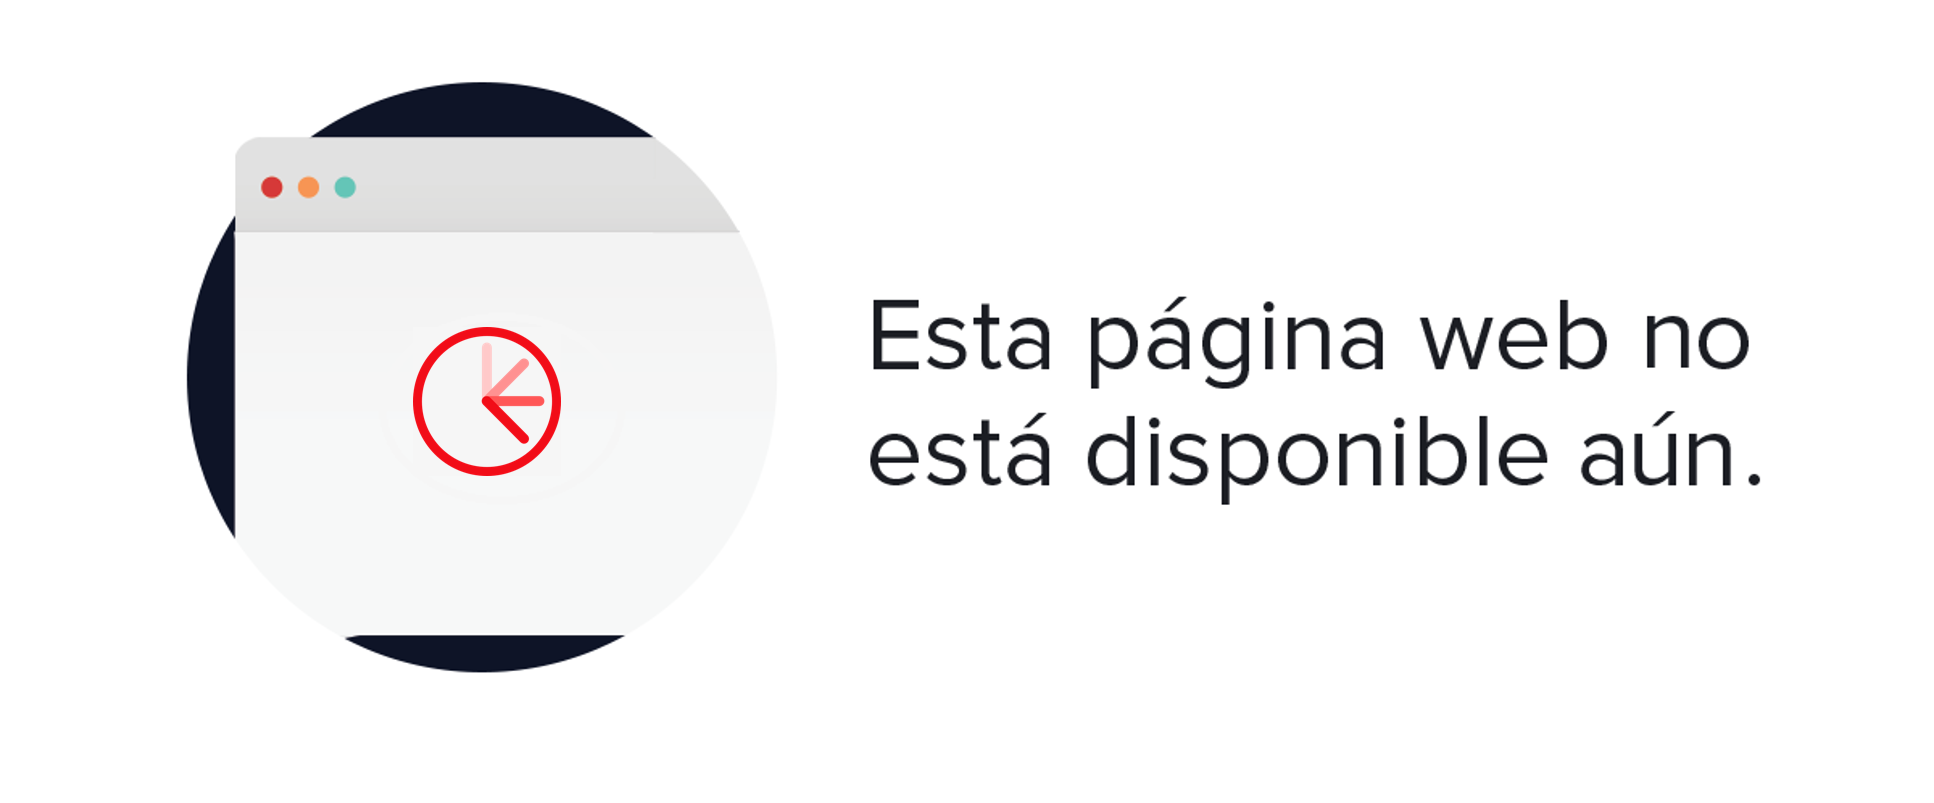 KARL LAGERFELD Sneakers karl x kaia Azul marino/negro CÓDIGO DEL ARTÍCULO 68I-WEP020 - XYYQFQD